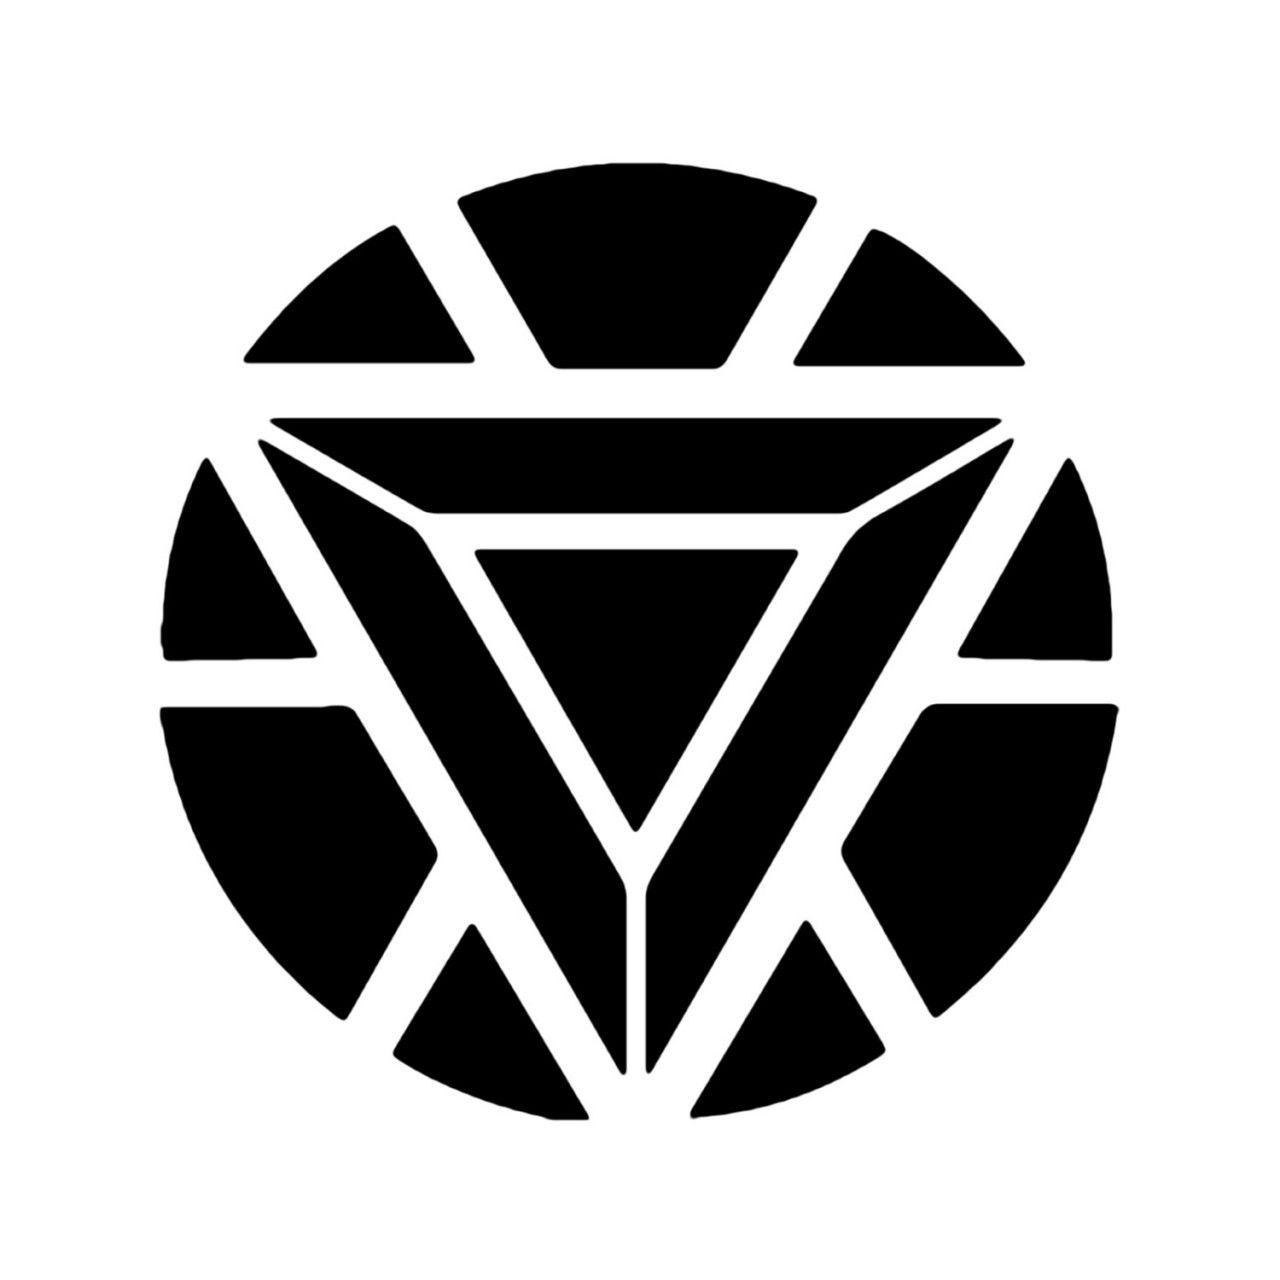 ironman symbol - Google Search | Templates | Pinterest ... Iron Man Symbol